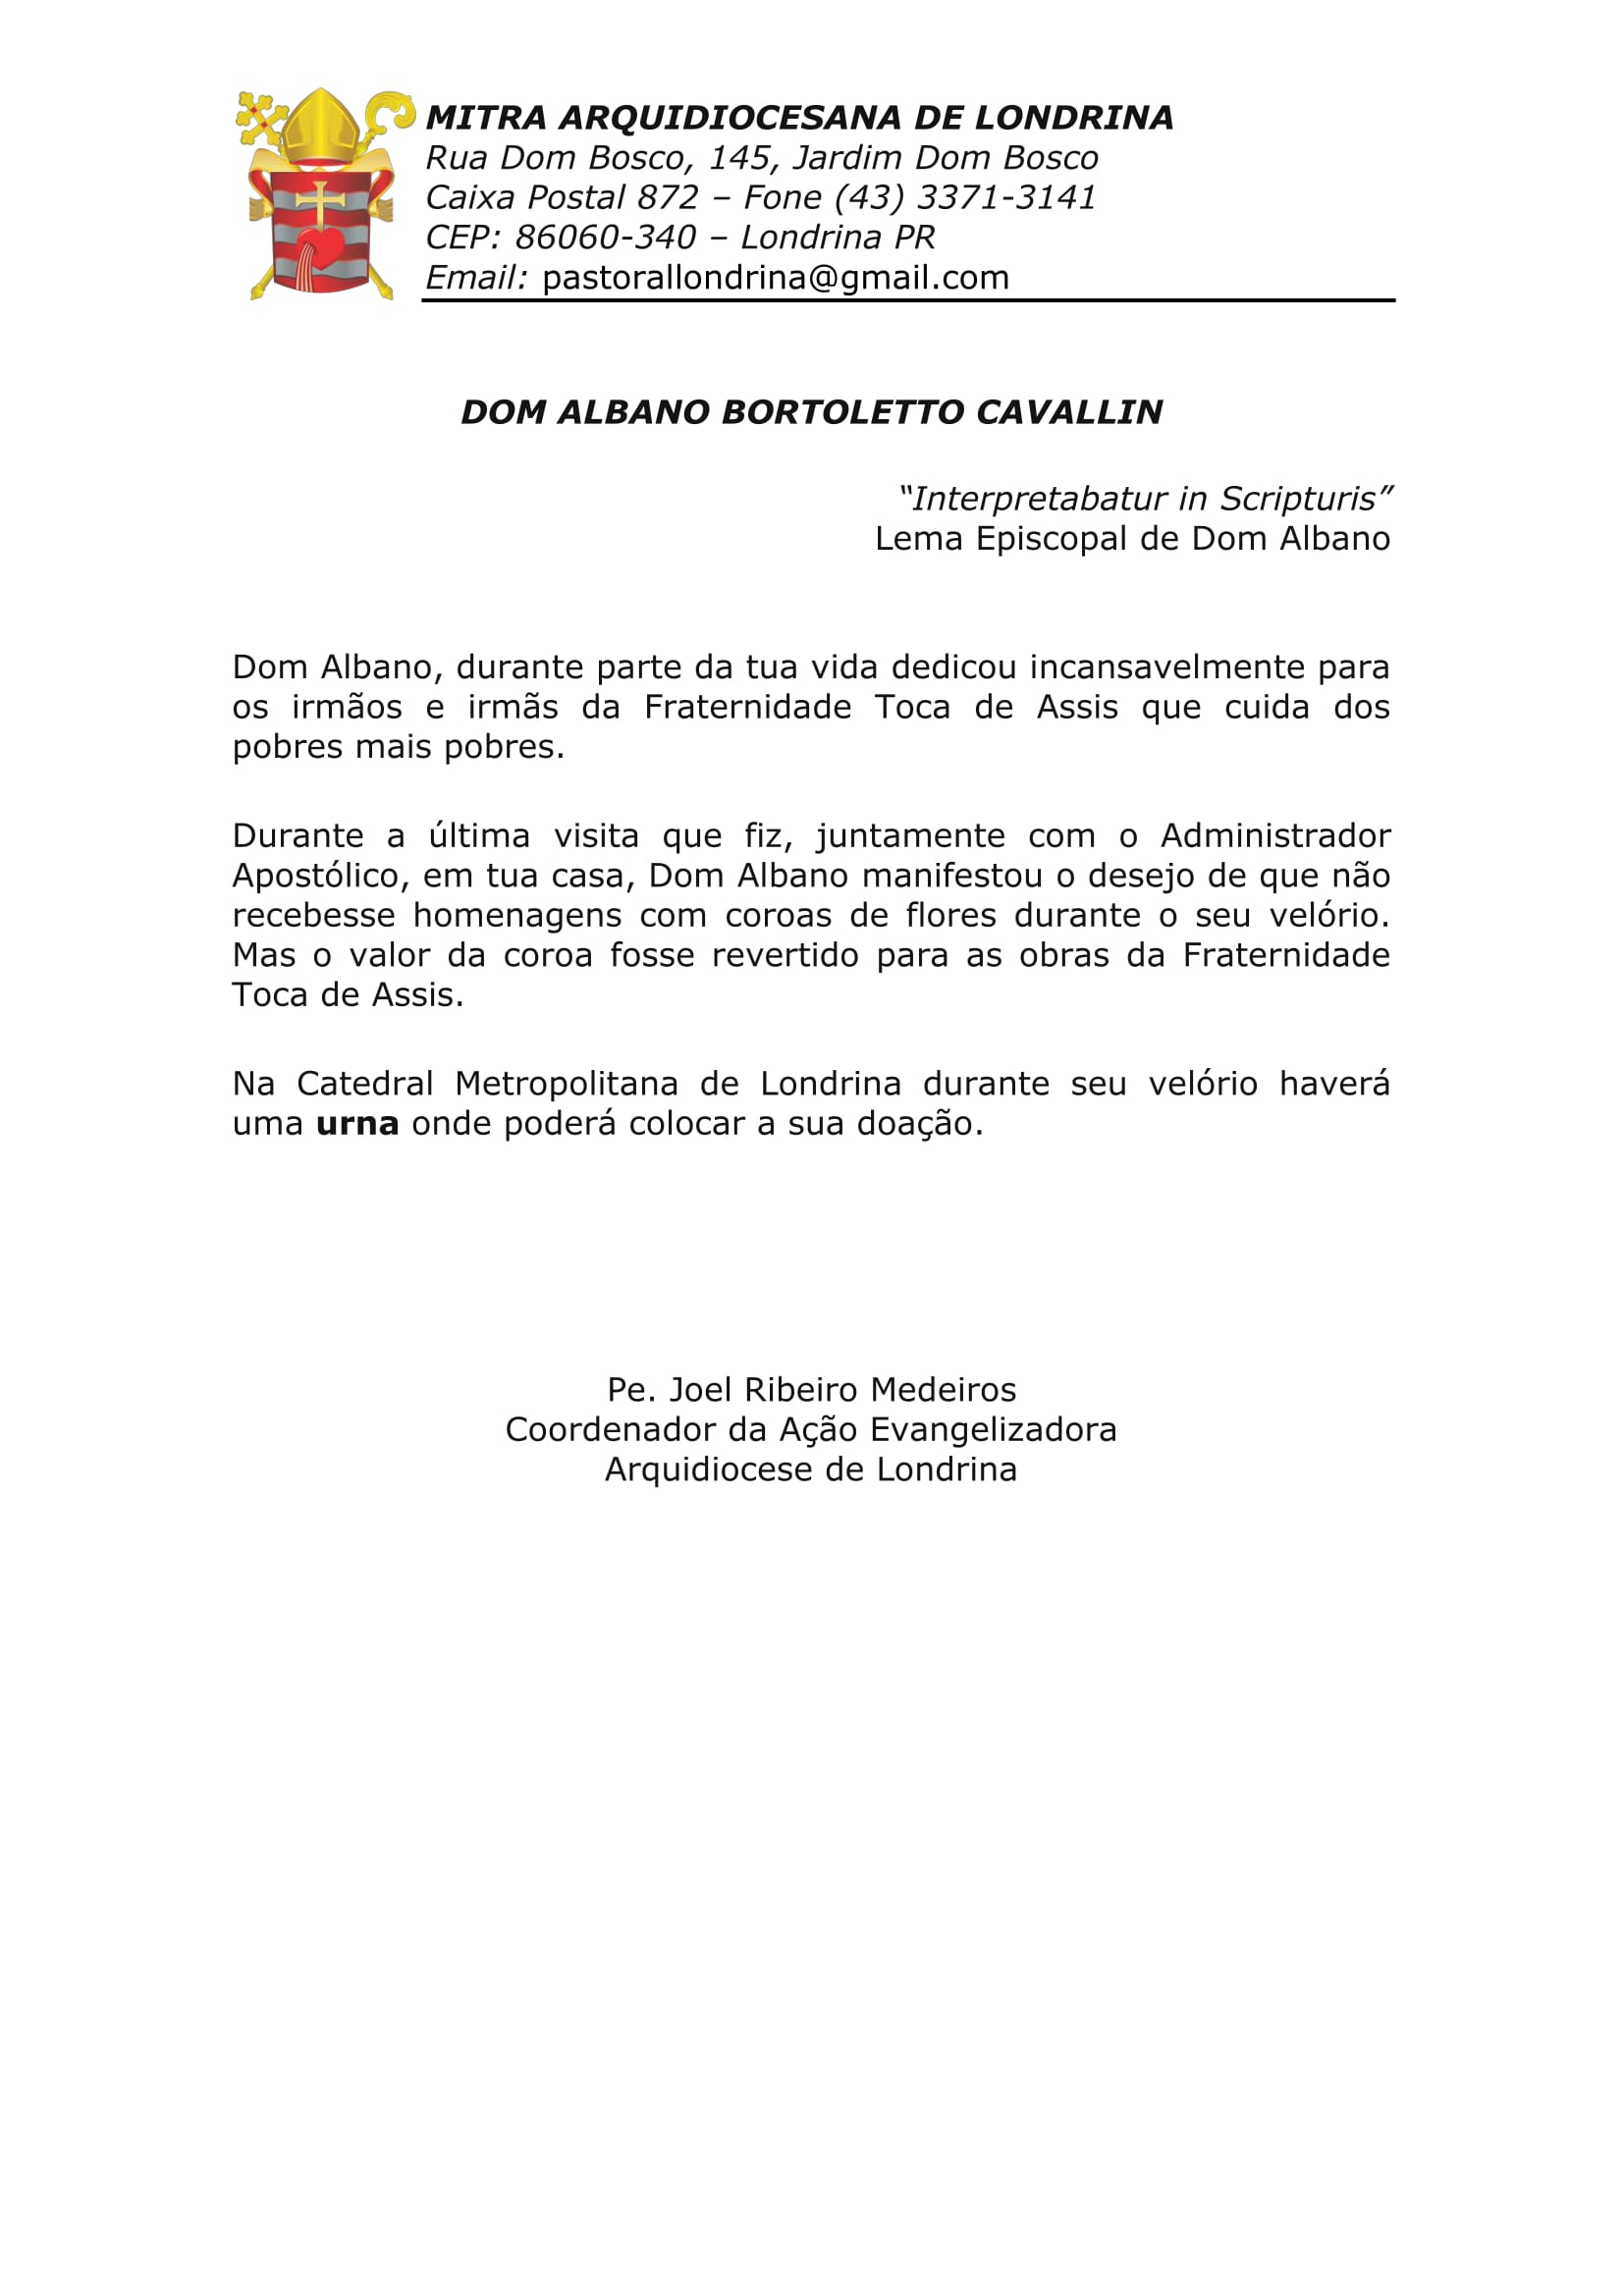 dom albano 11